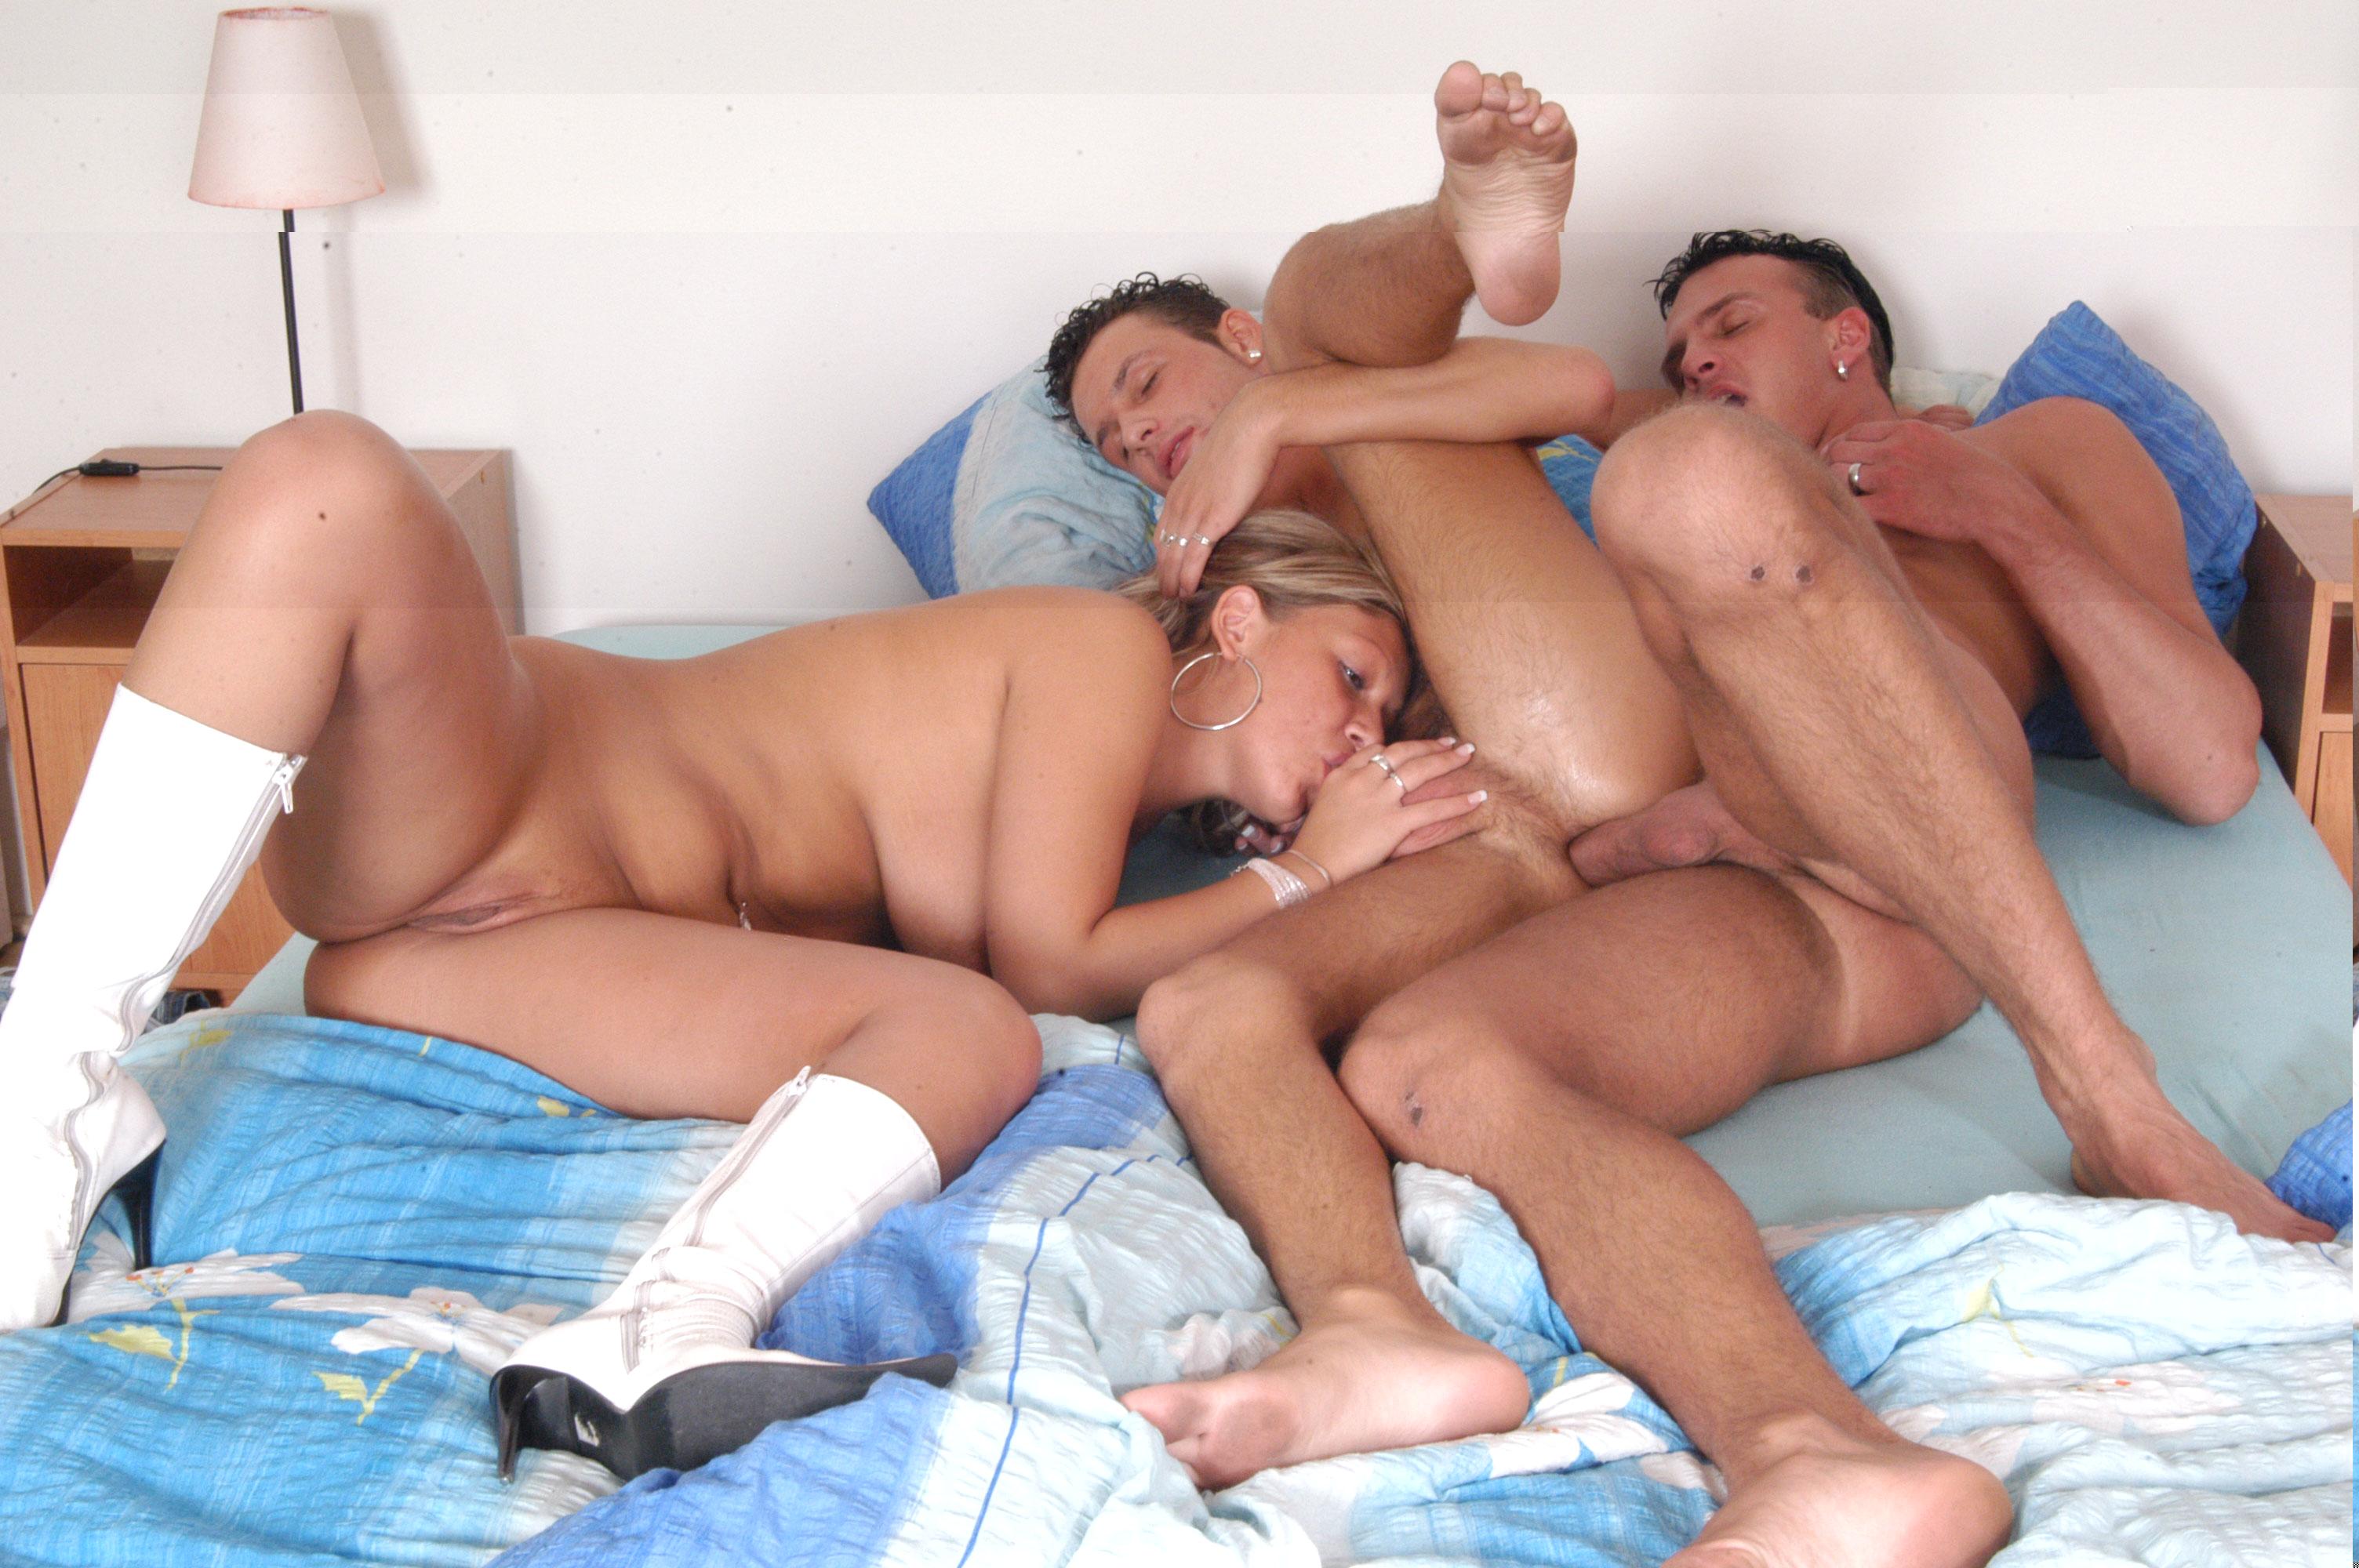 Bisexual bareback